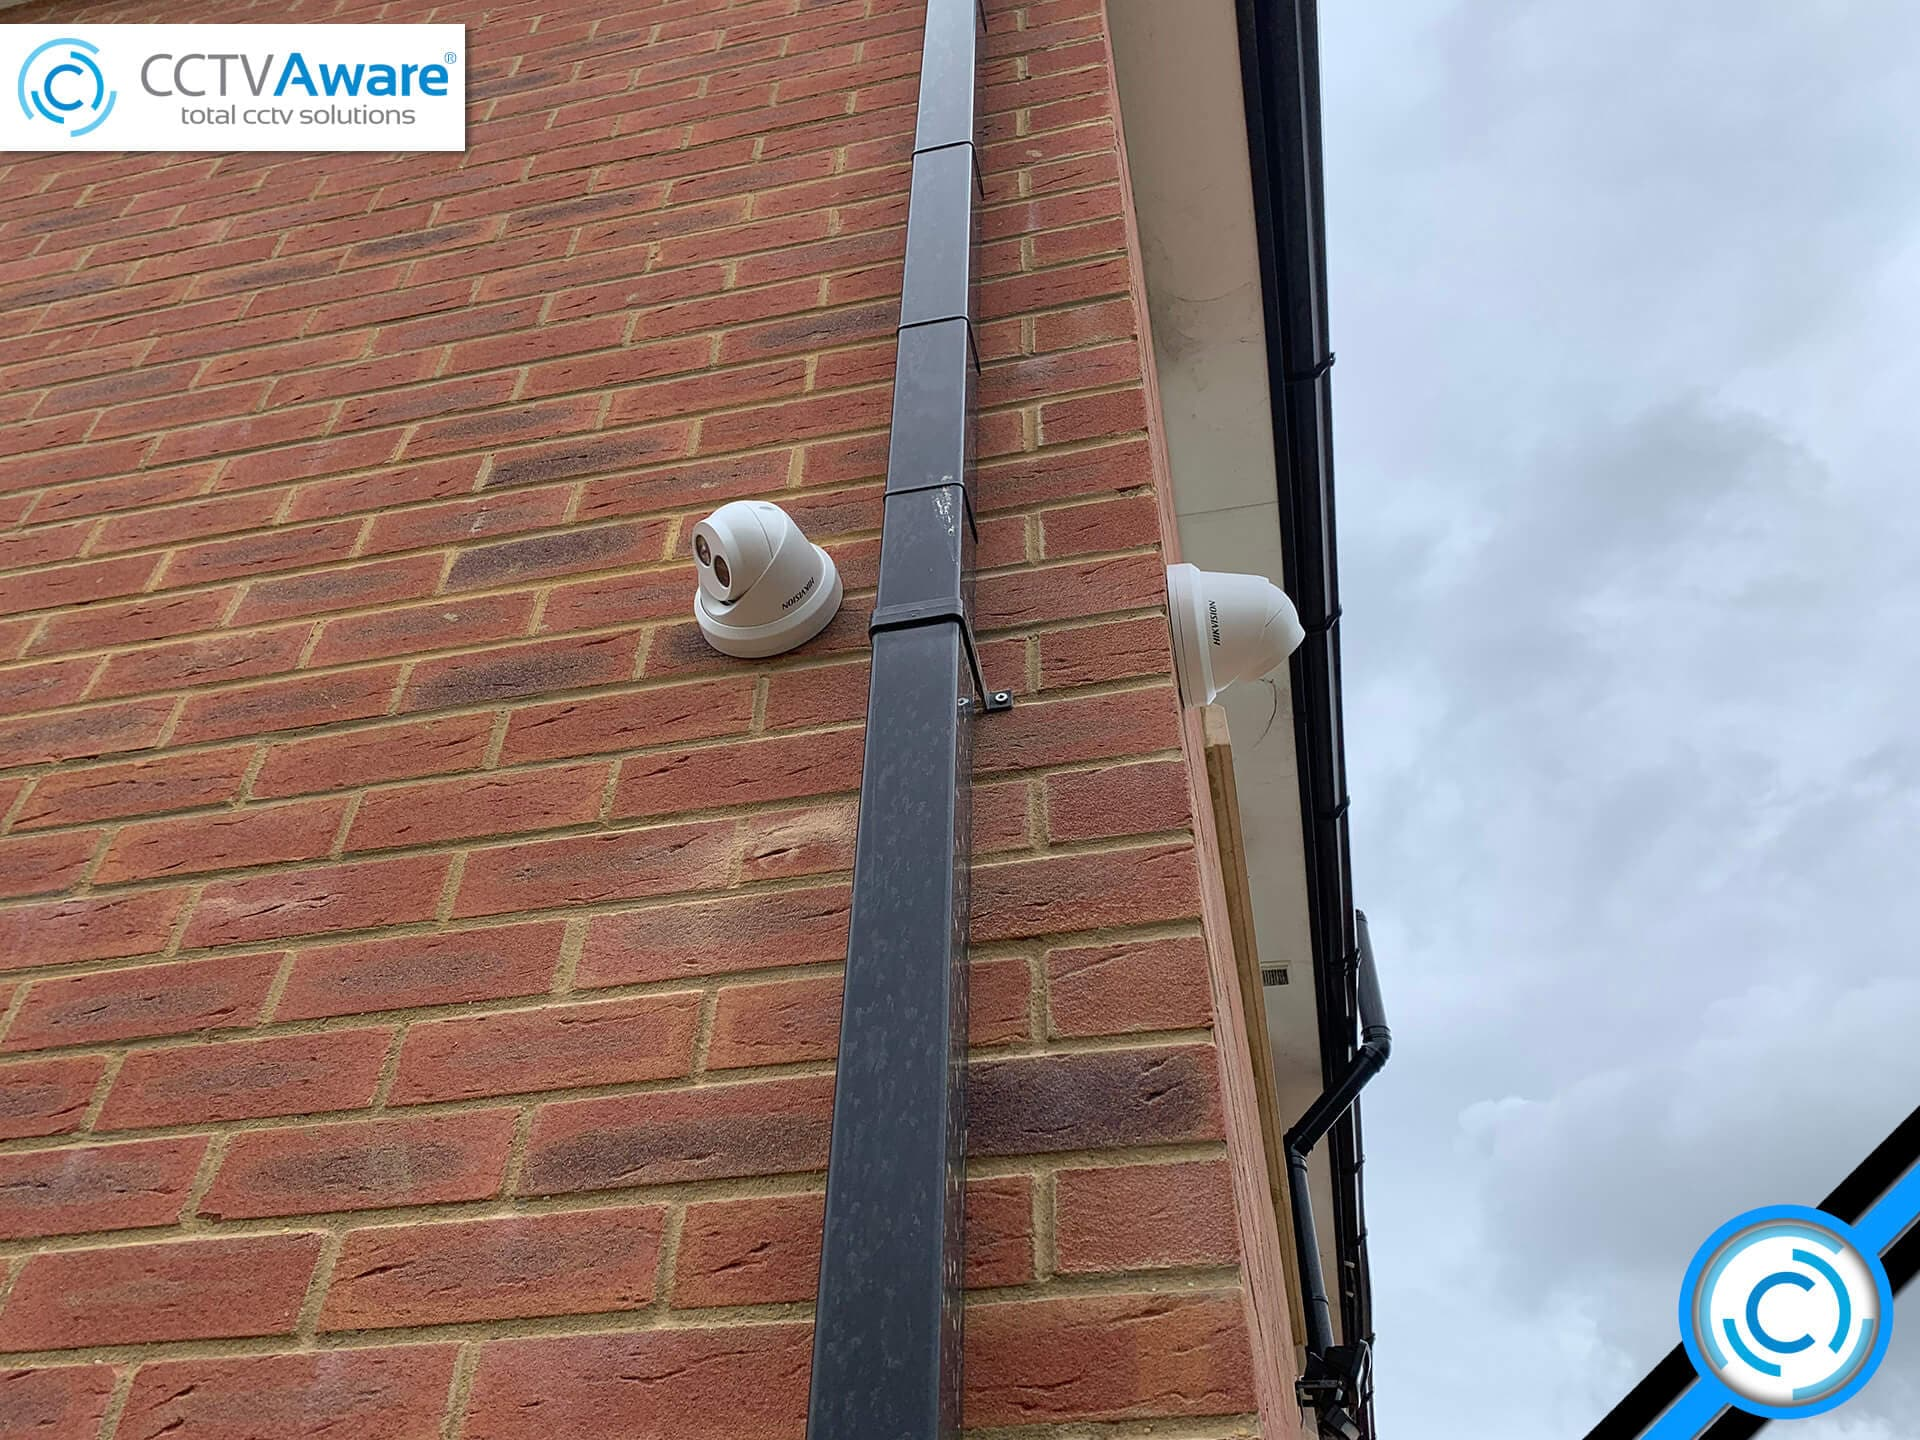 2MP CCTV Installation in Basildon